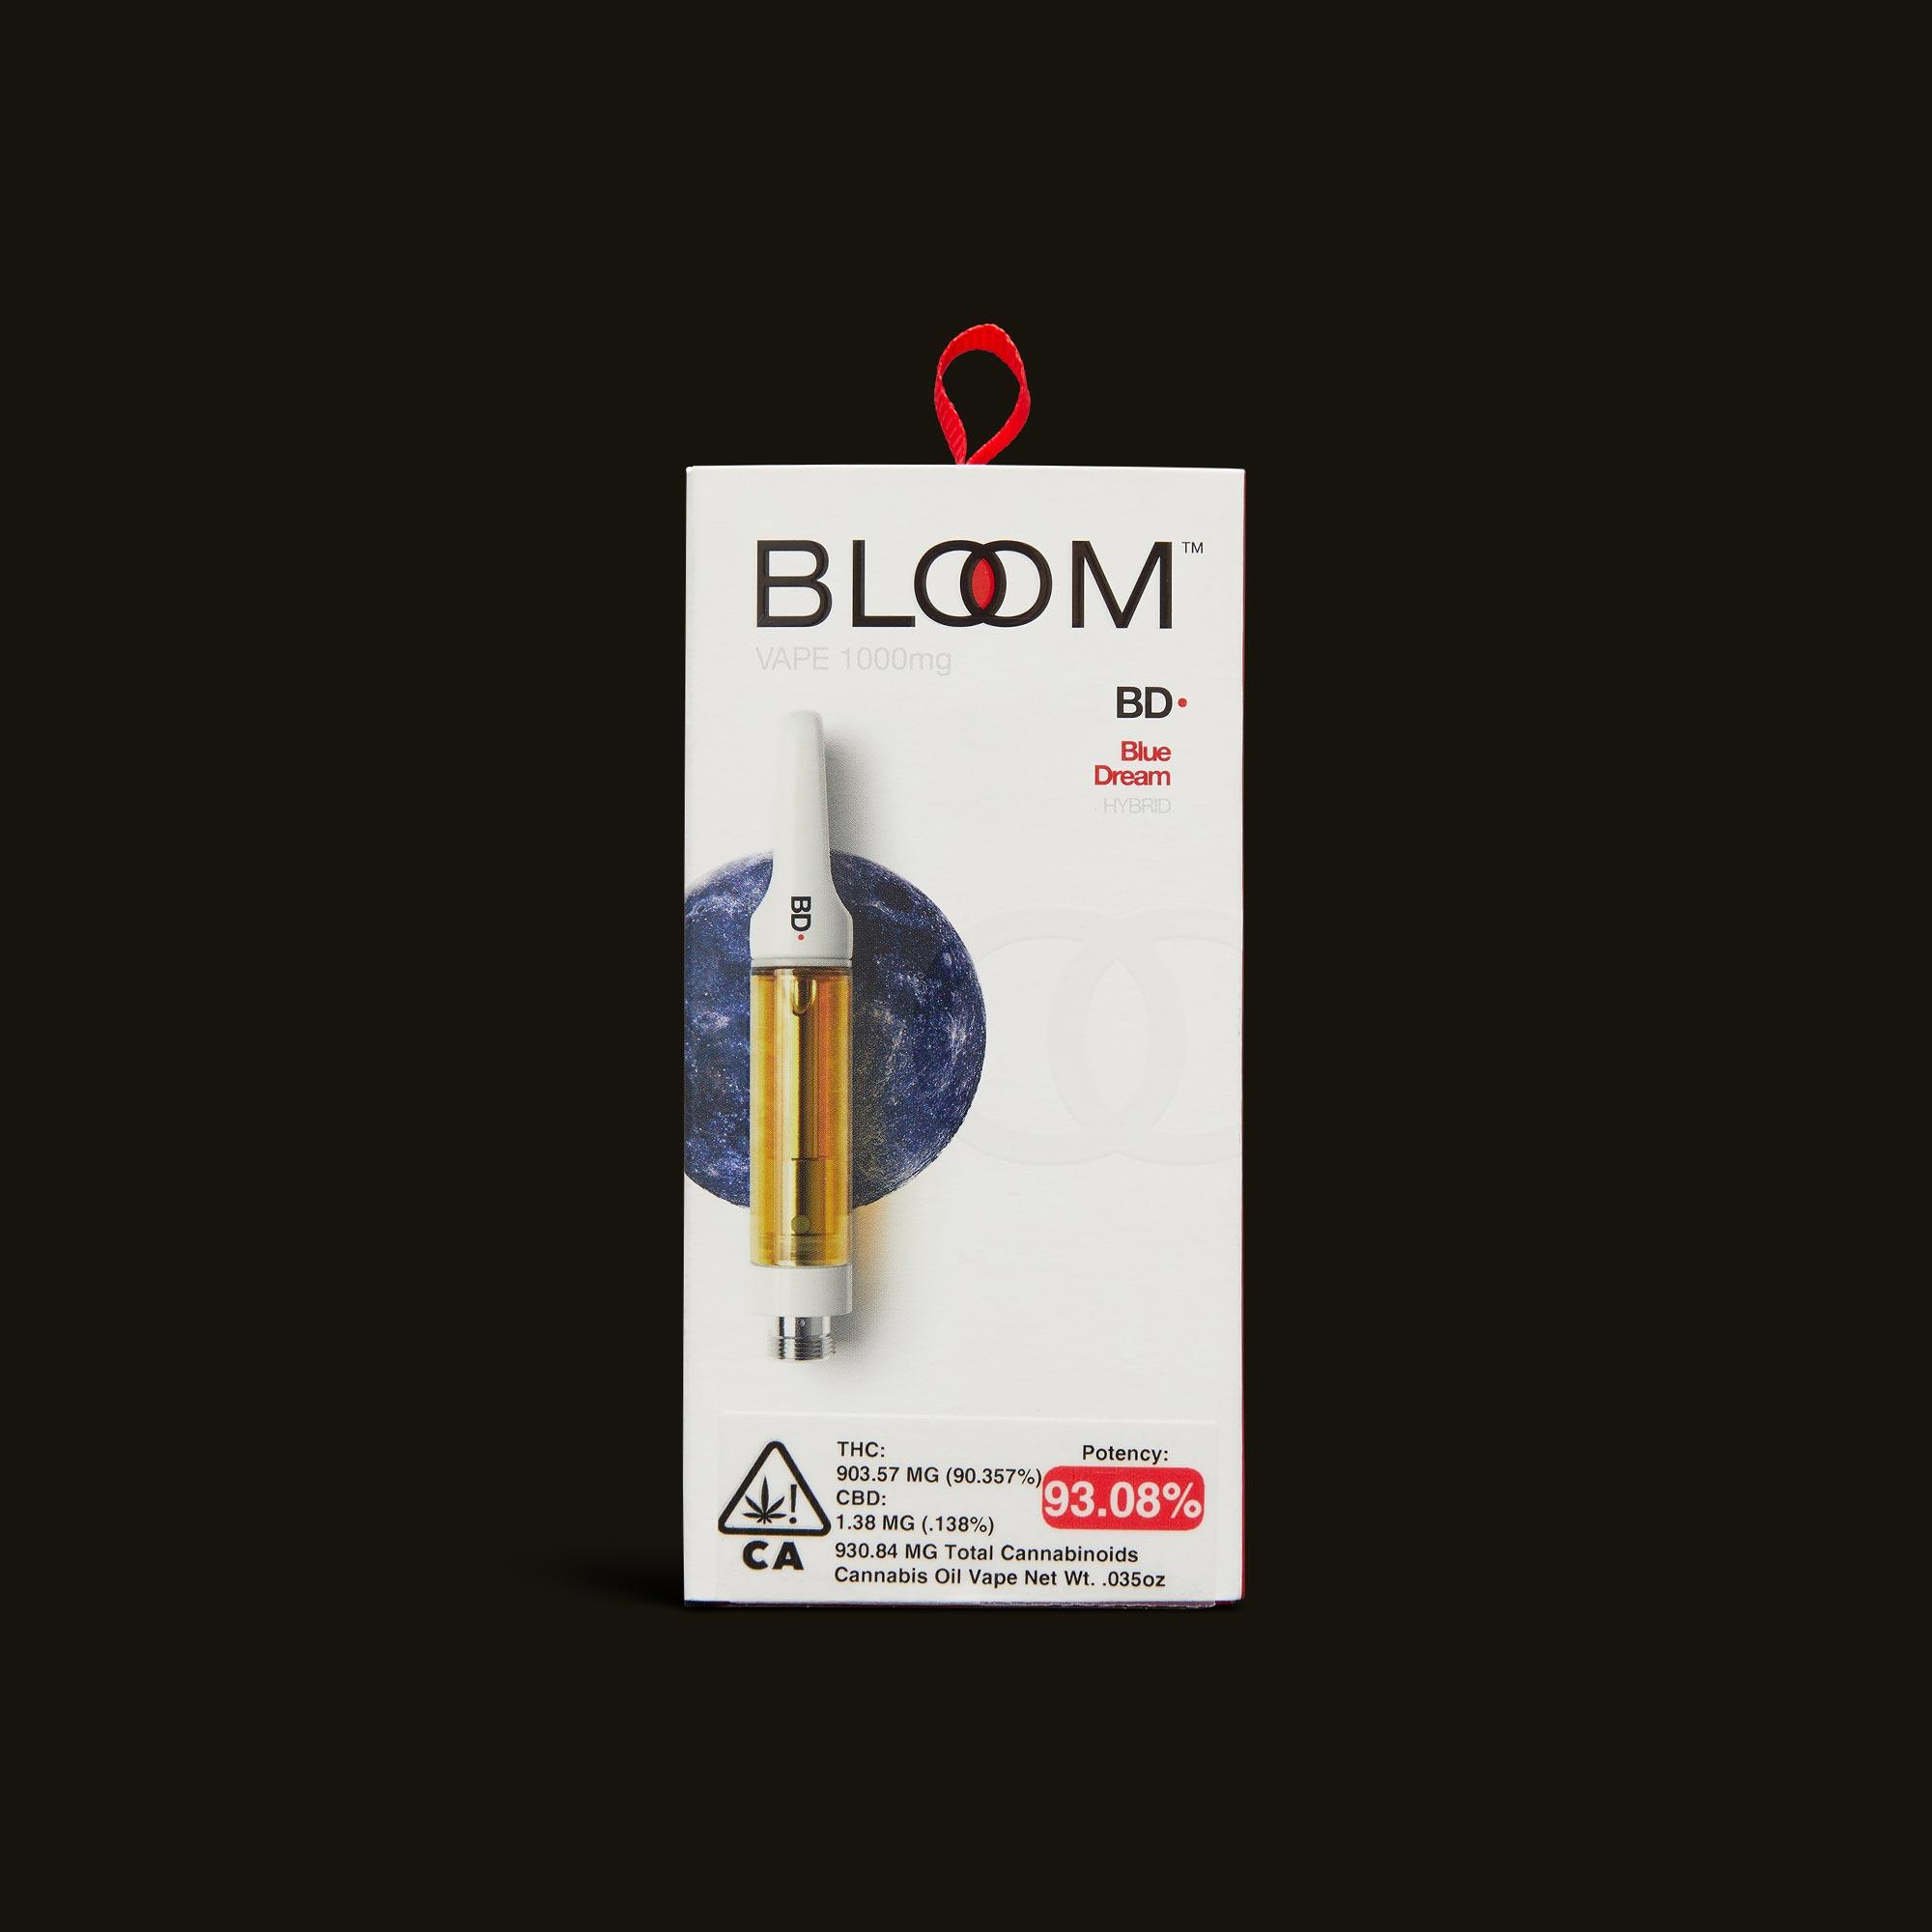 Blue Dream Cartridge - 1g - 1g cartridge